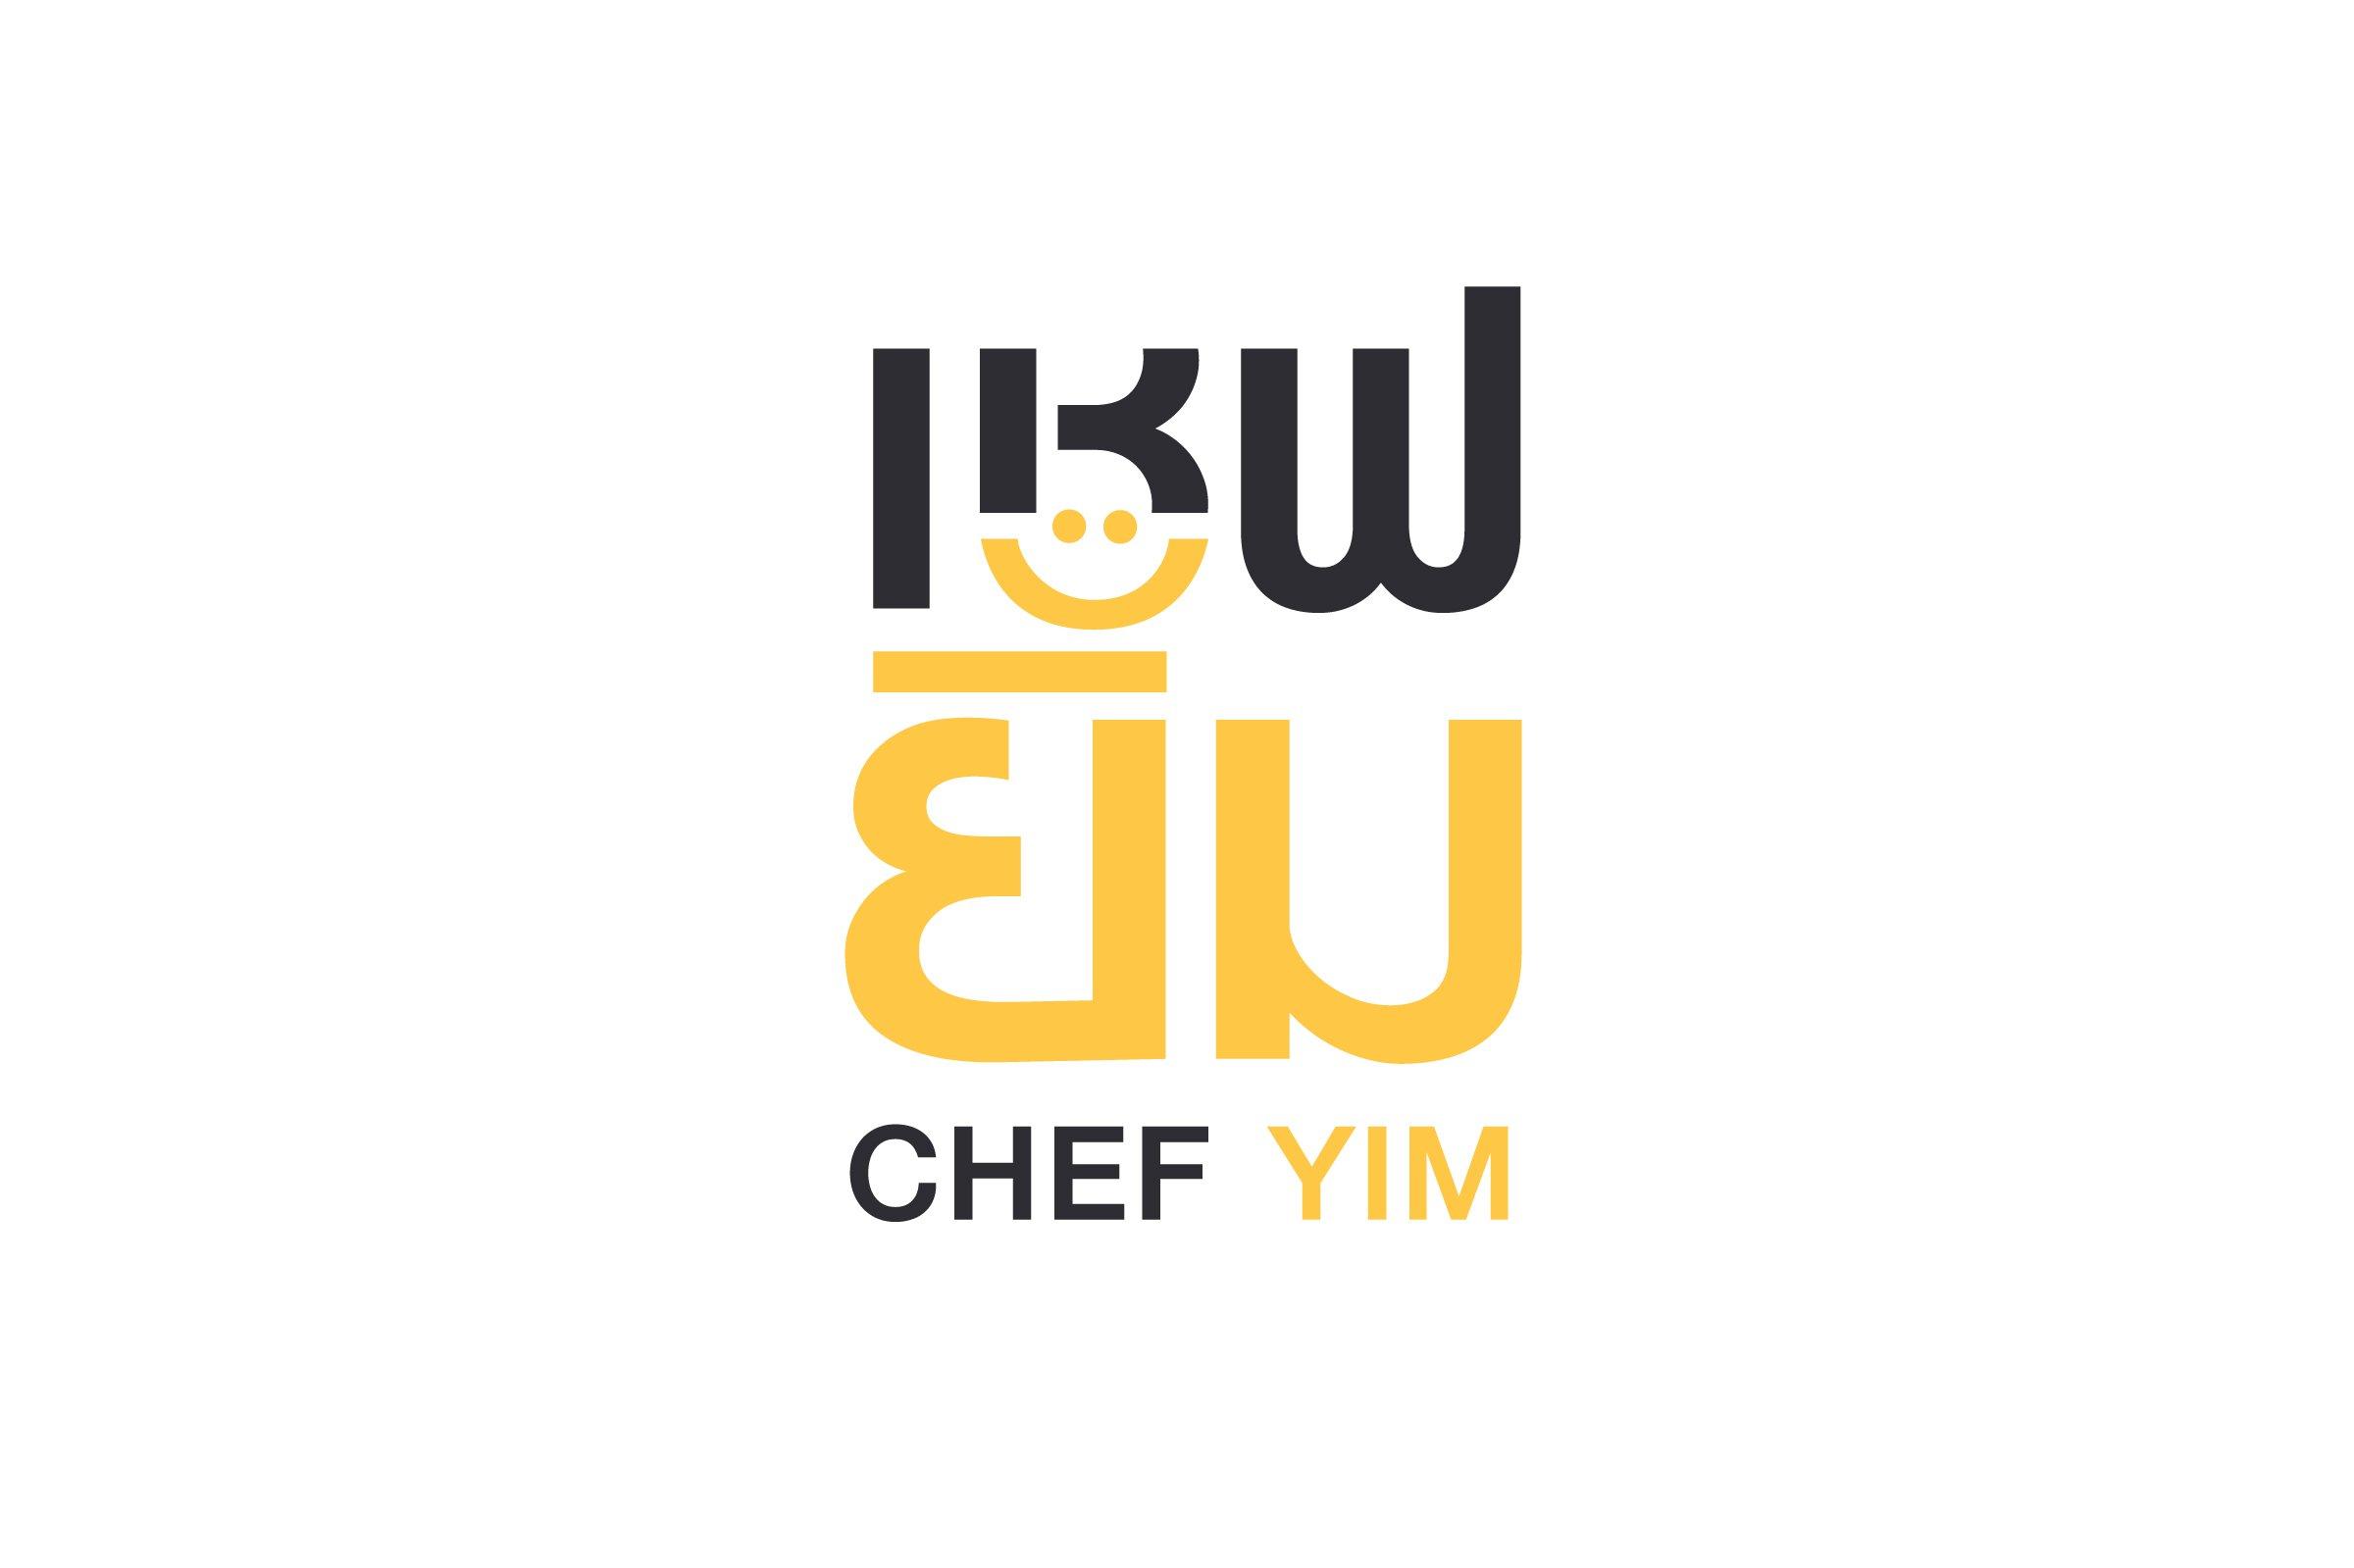 Chef Yim